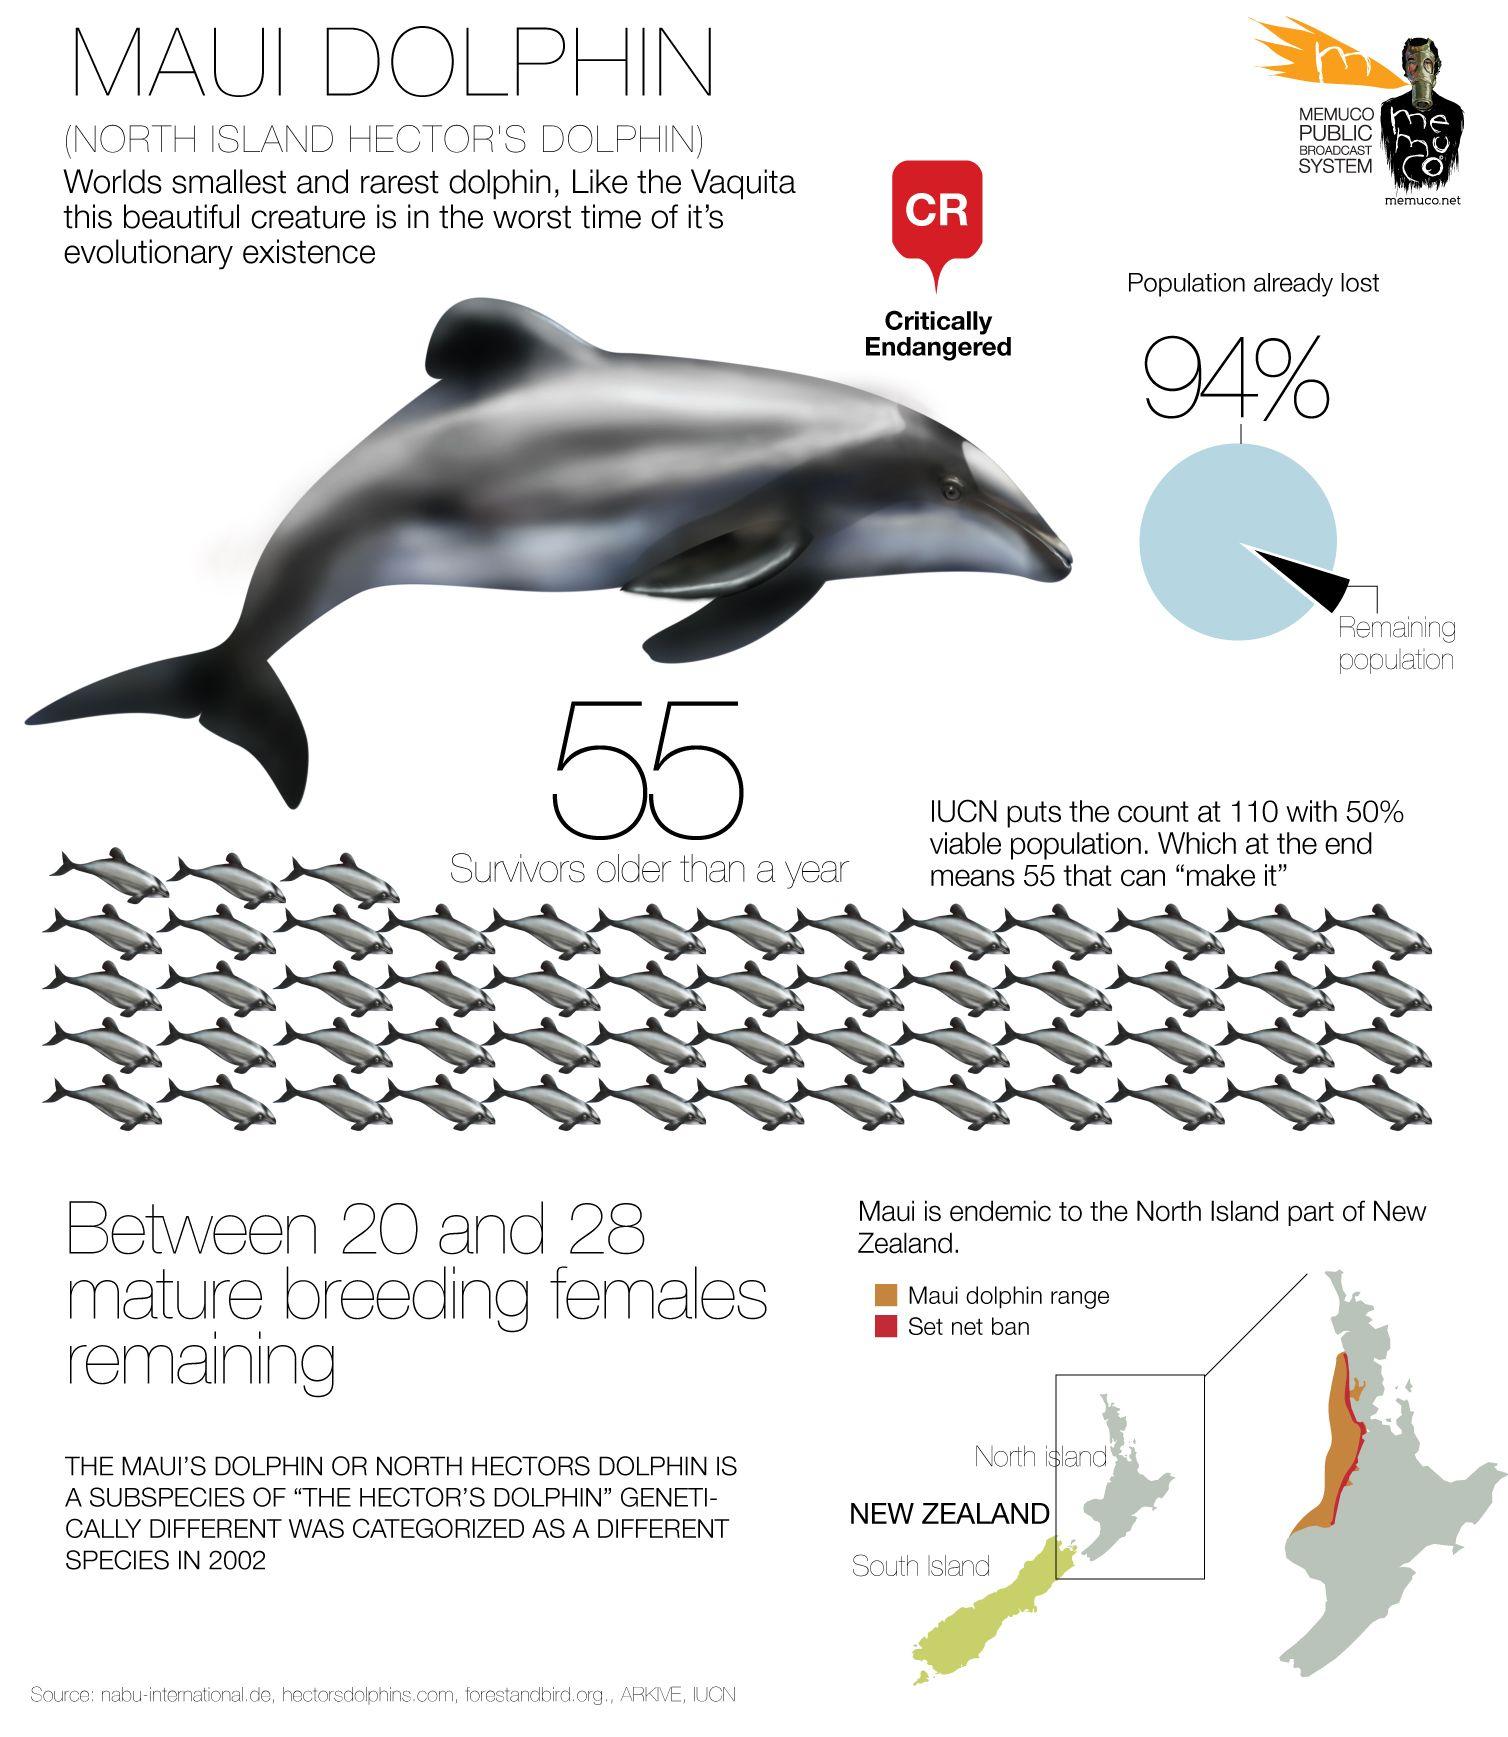 maui dolphin wildlife pinterest